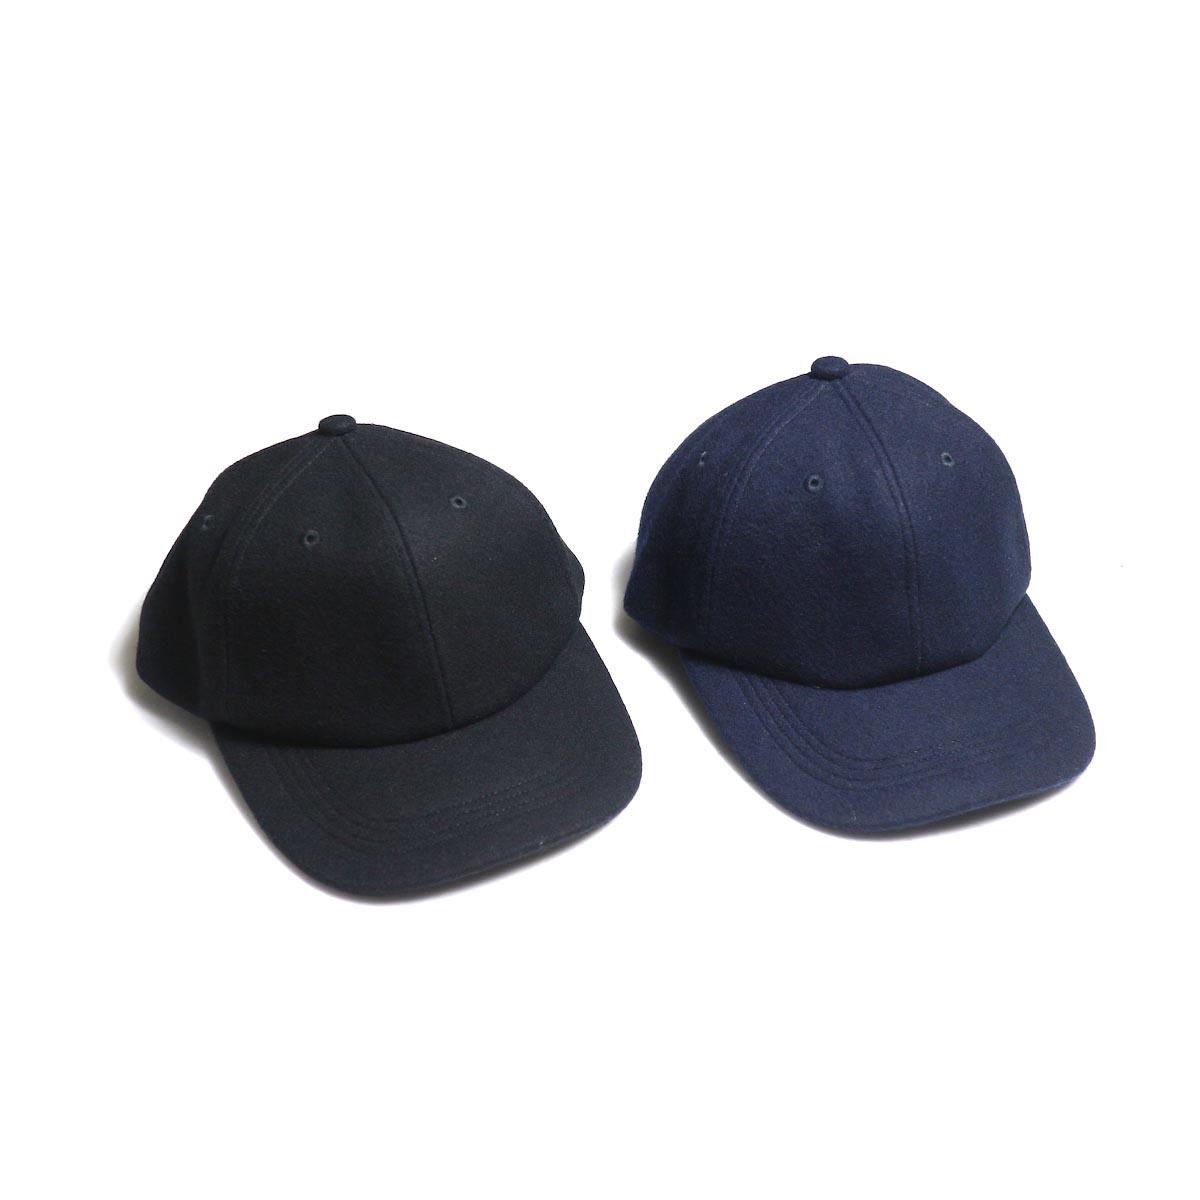 KIJIMA TAKAYUKI / Wool Baseball Cap (No.192835)